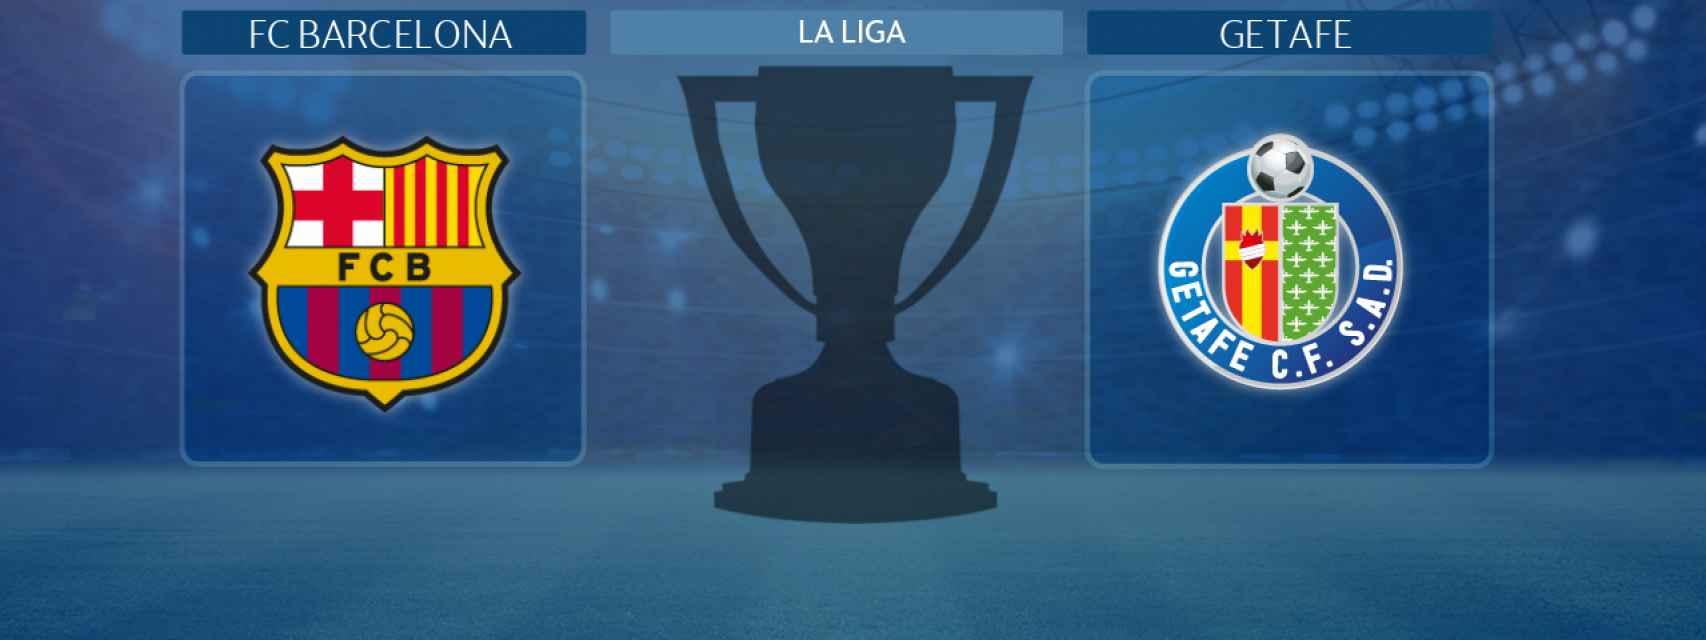 FC Barcelona - Getafe, partido de La Liga